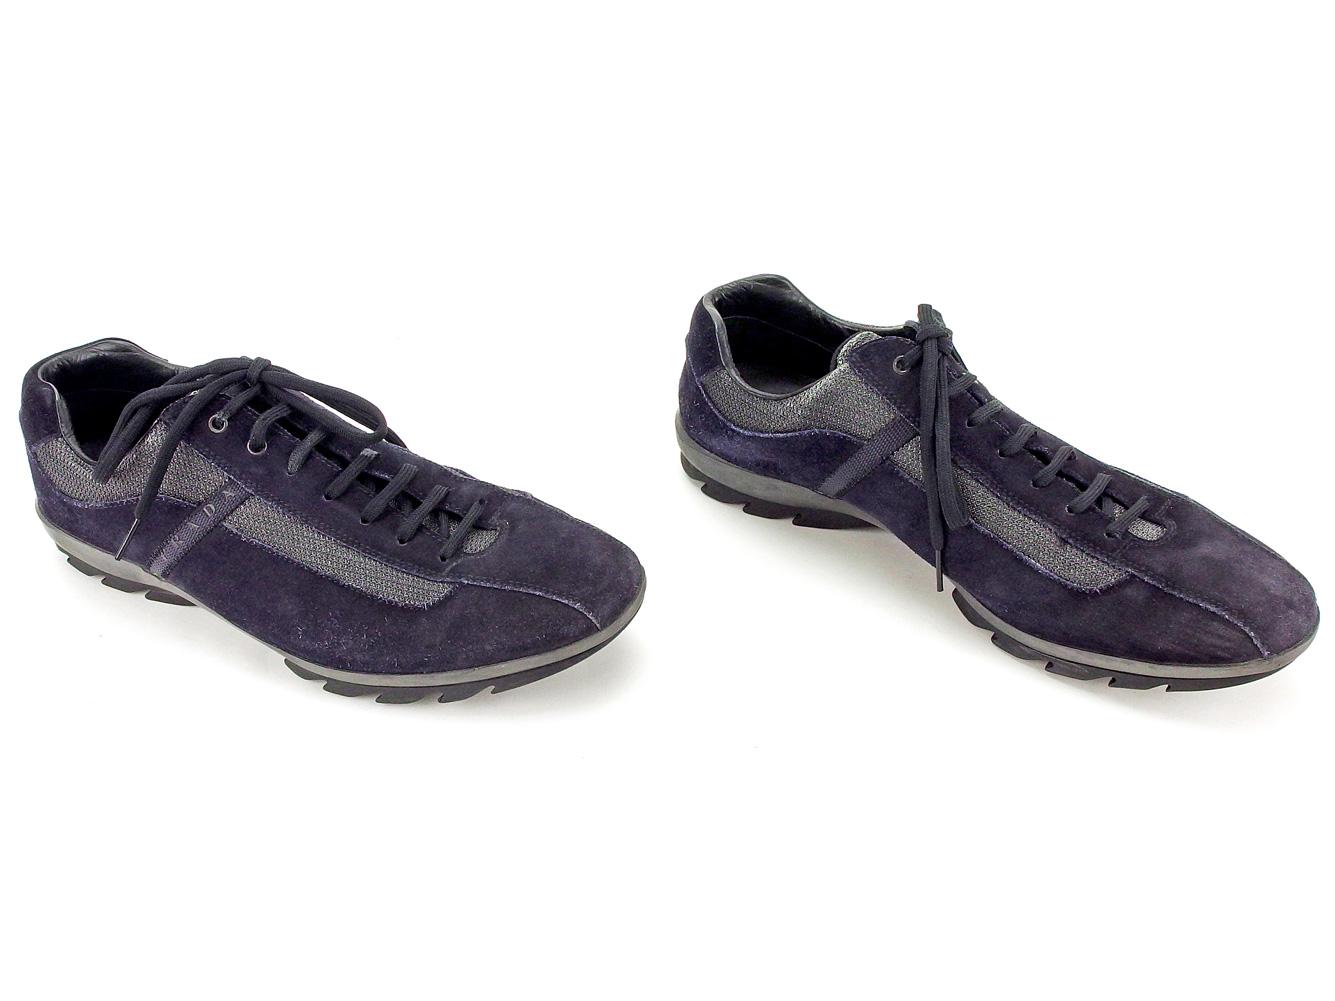 cf8a94404 ... inexpensive prada prada sneakers sports shoes shoes men black nylon x leather  popularity sale c2944 a6844